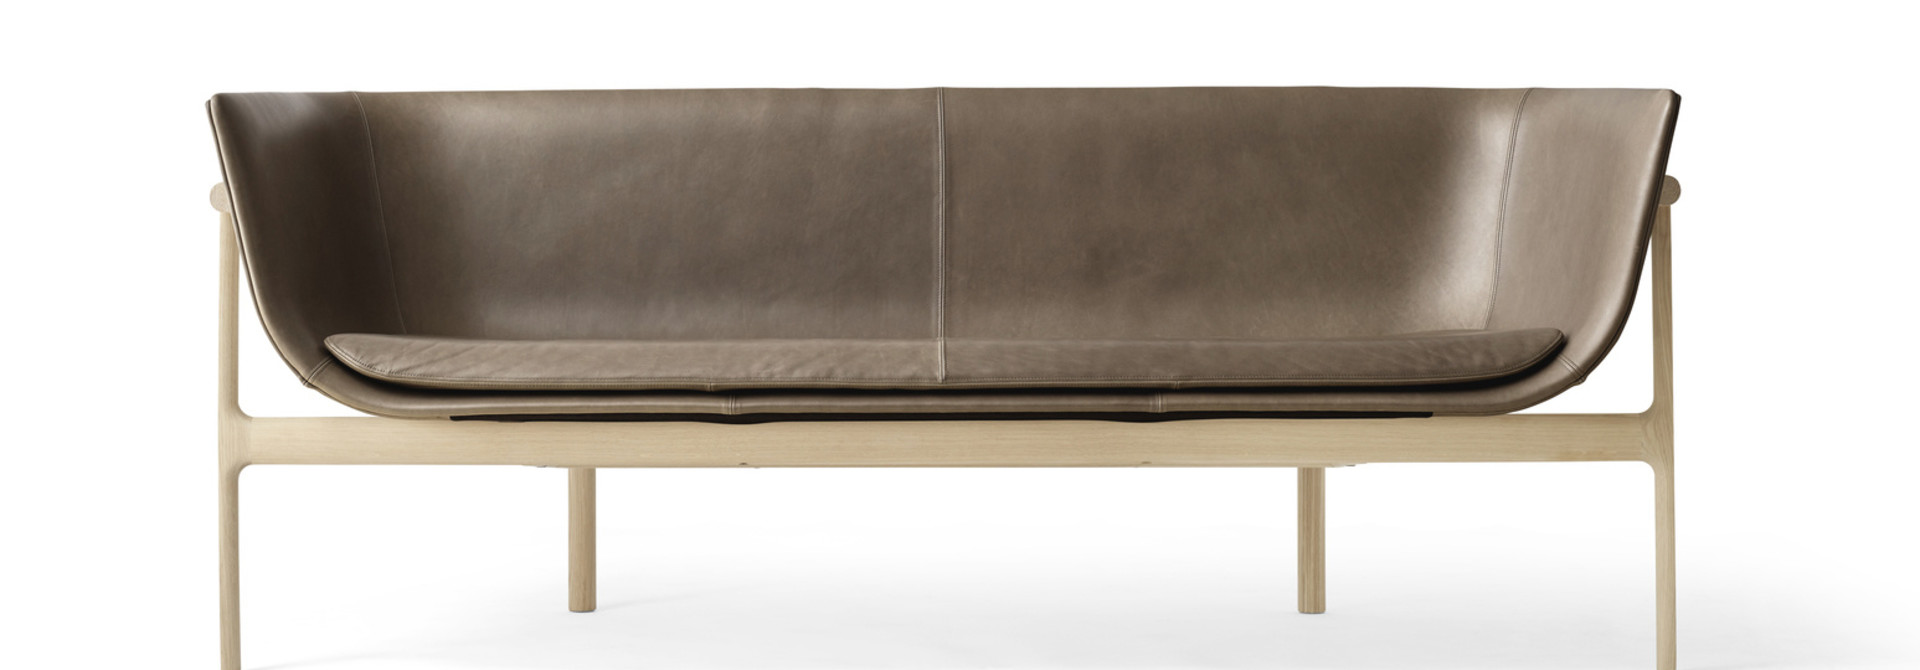 Tailor Sofa - Natural Oak/Dakar